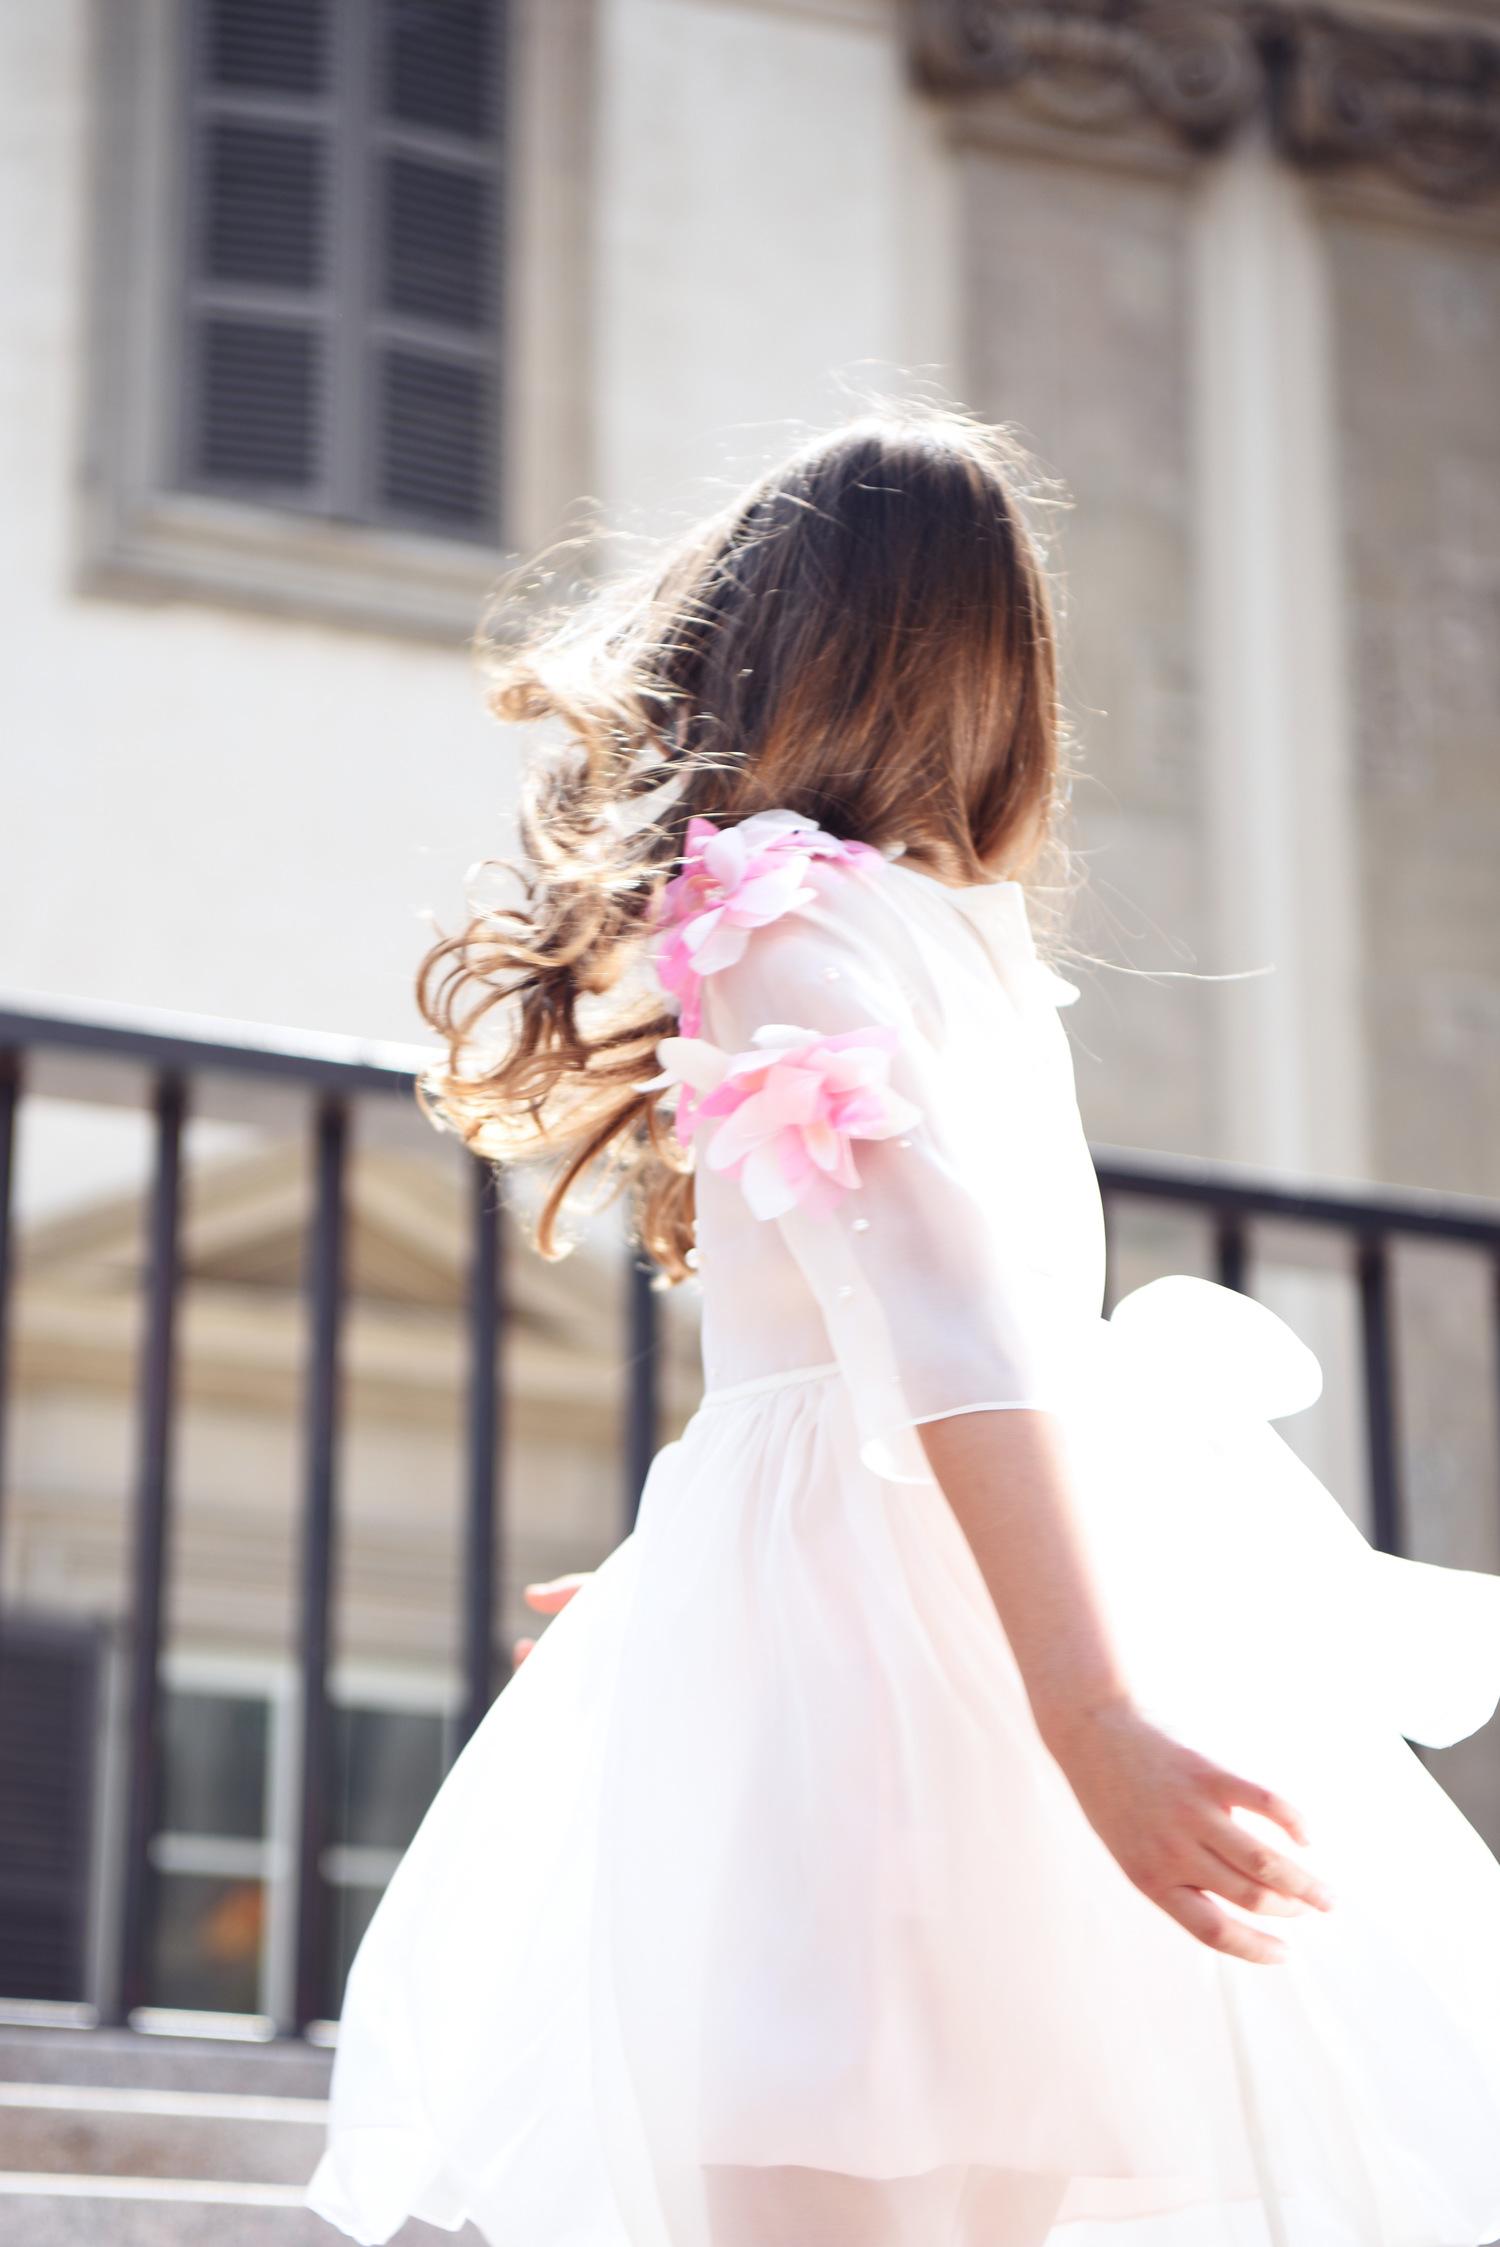 Enfant+Street+Style+by+Gina+Kim+Photography-2.jpeg